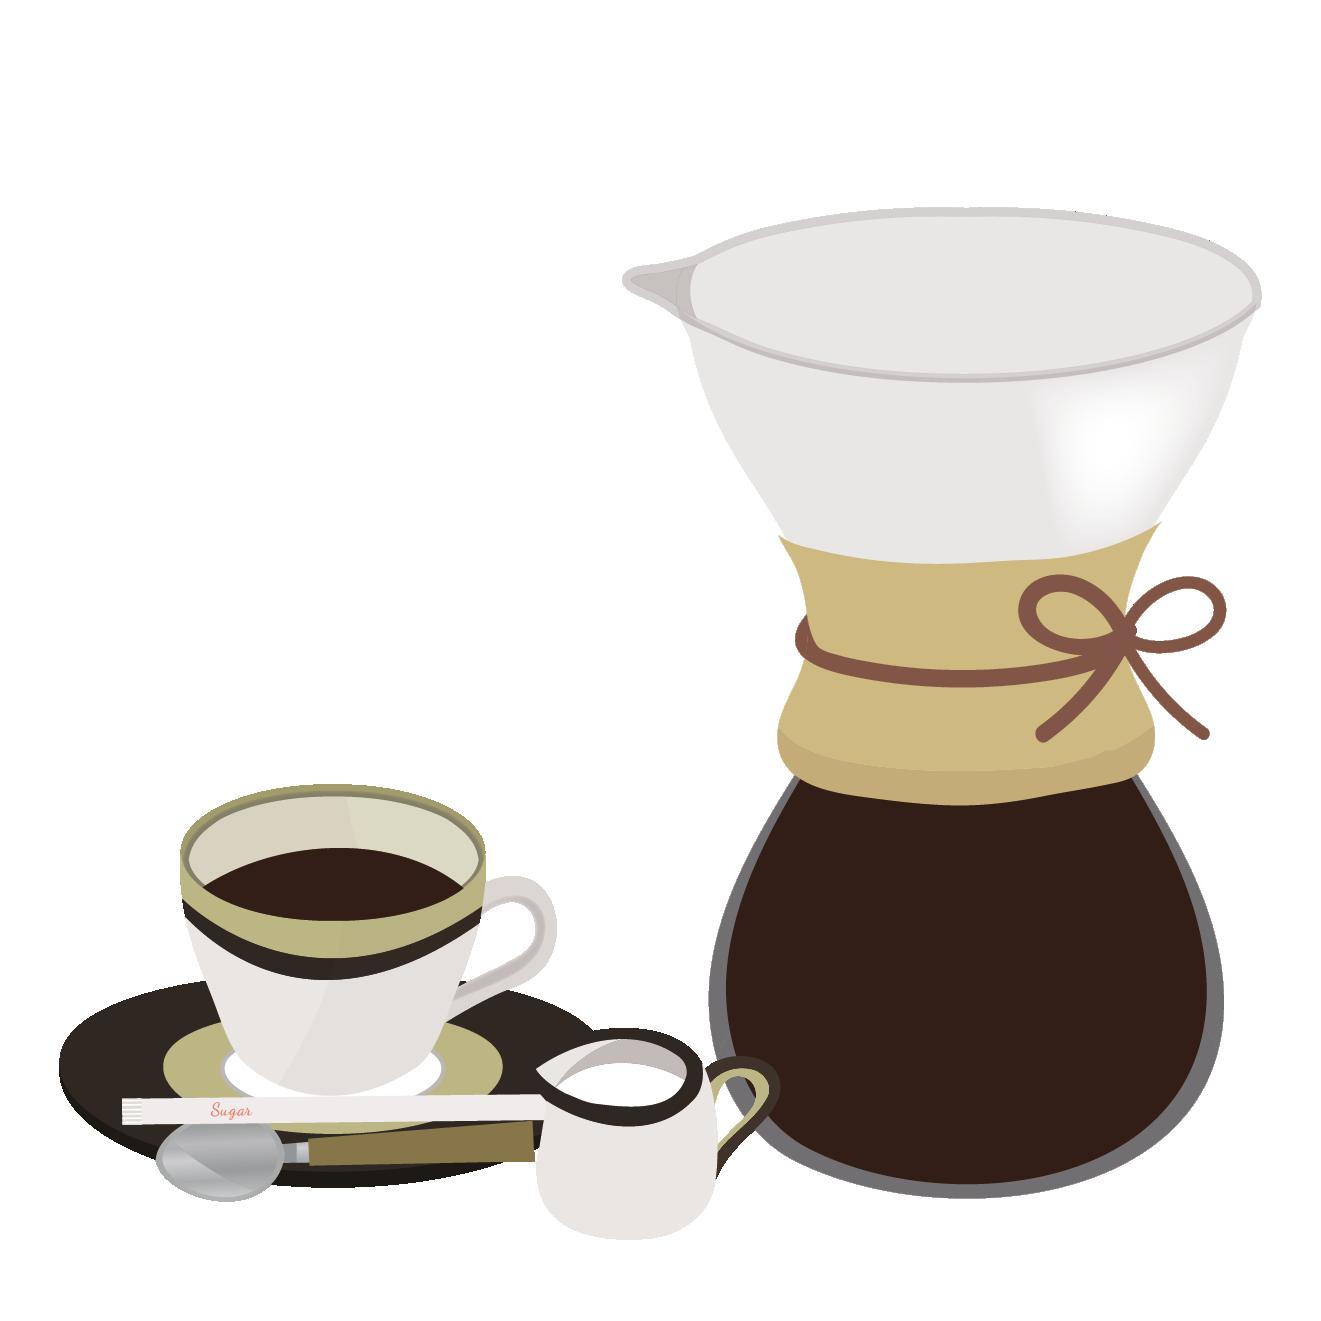 coffee-coffee-maker-01.png